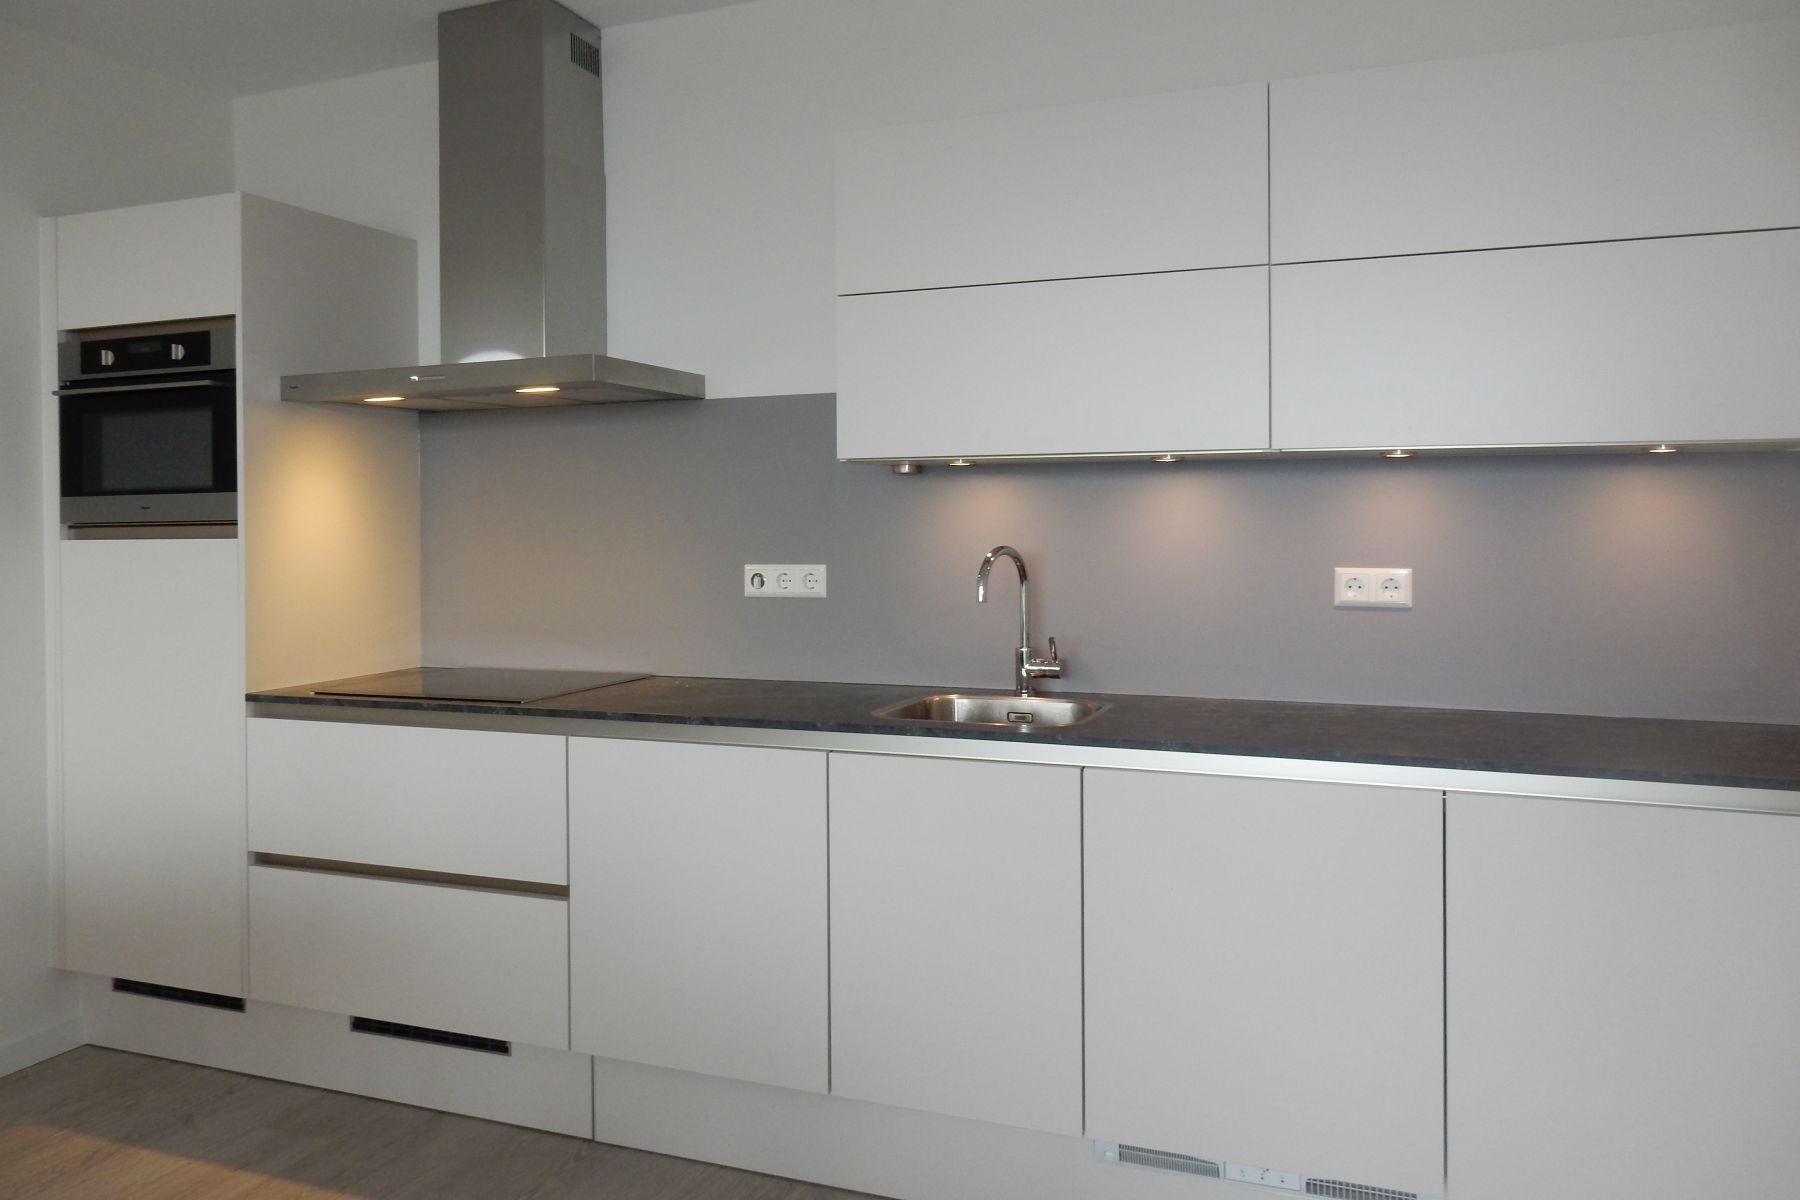 Achterwand Keuken Ideas : Ideas for kitchen back panels